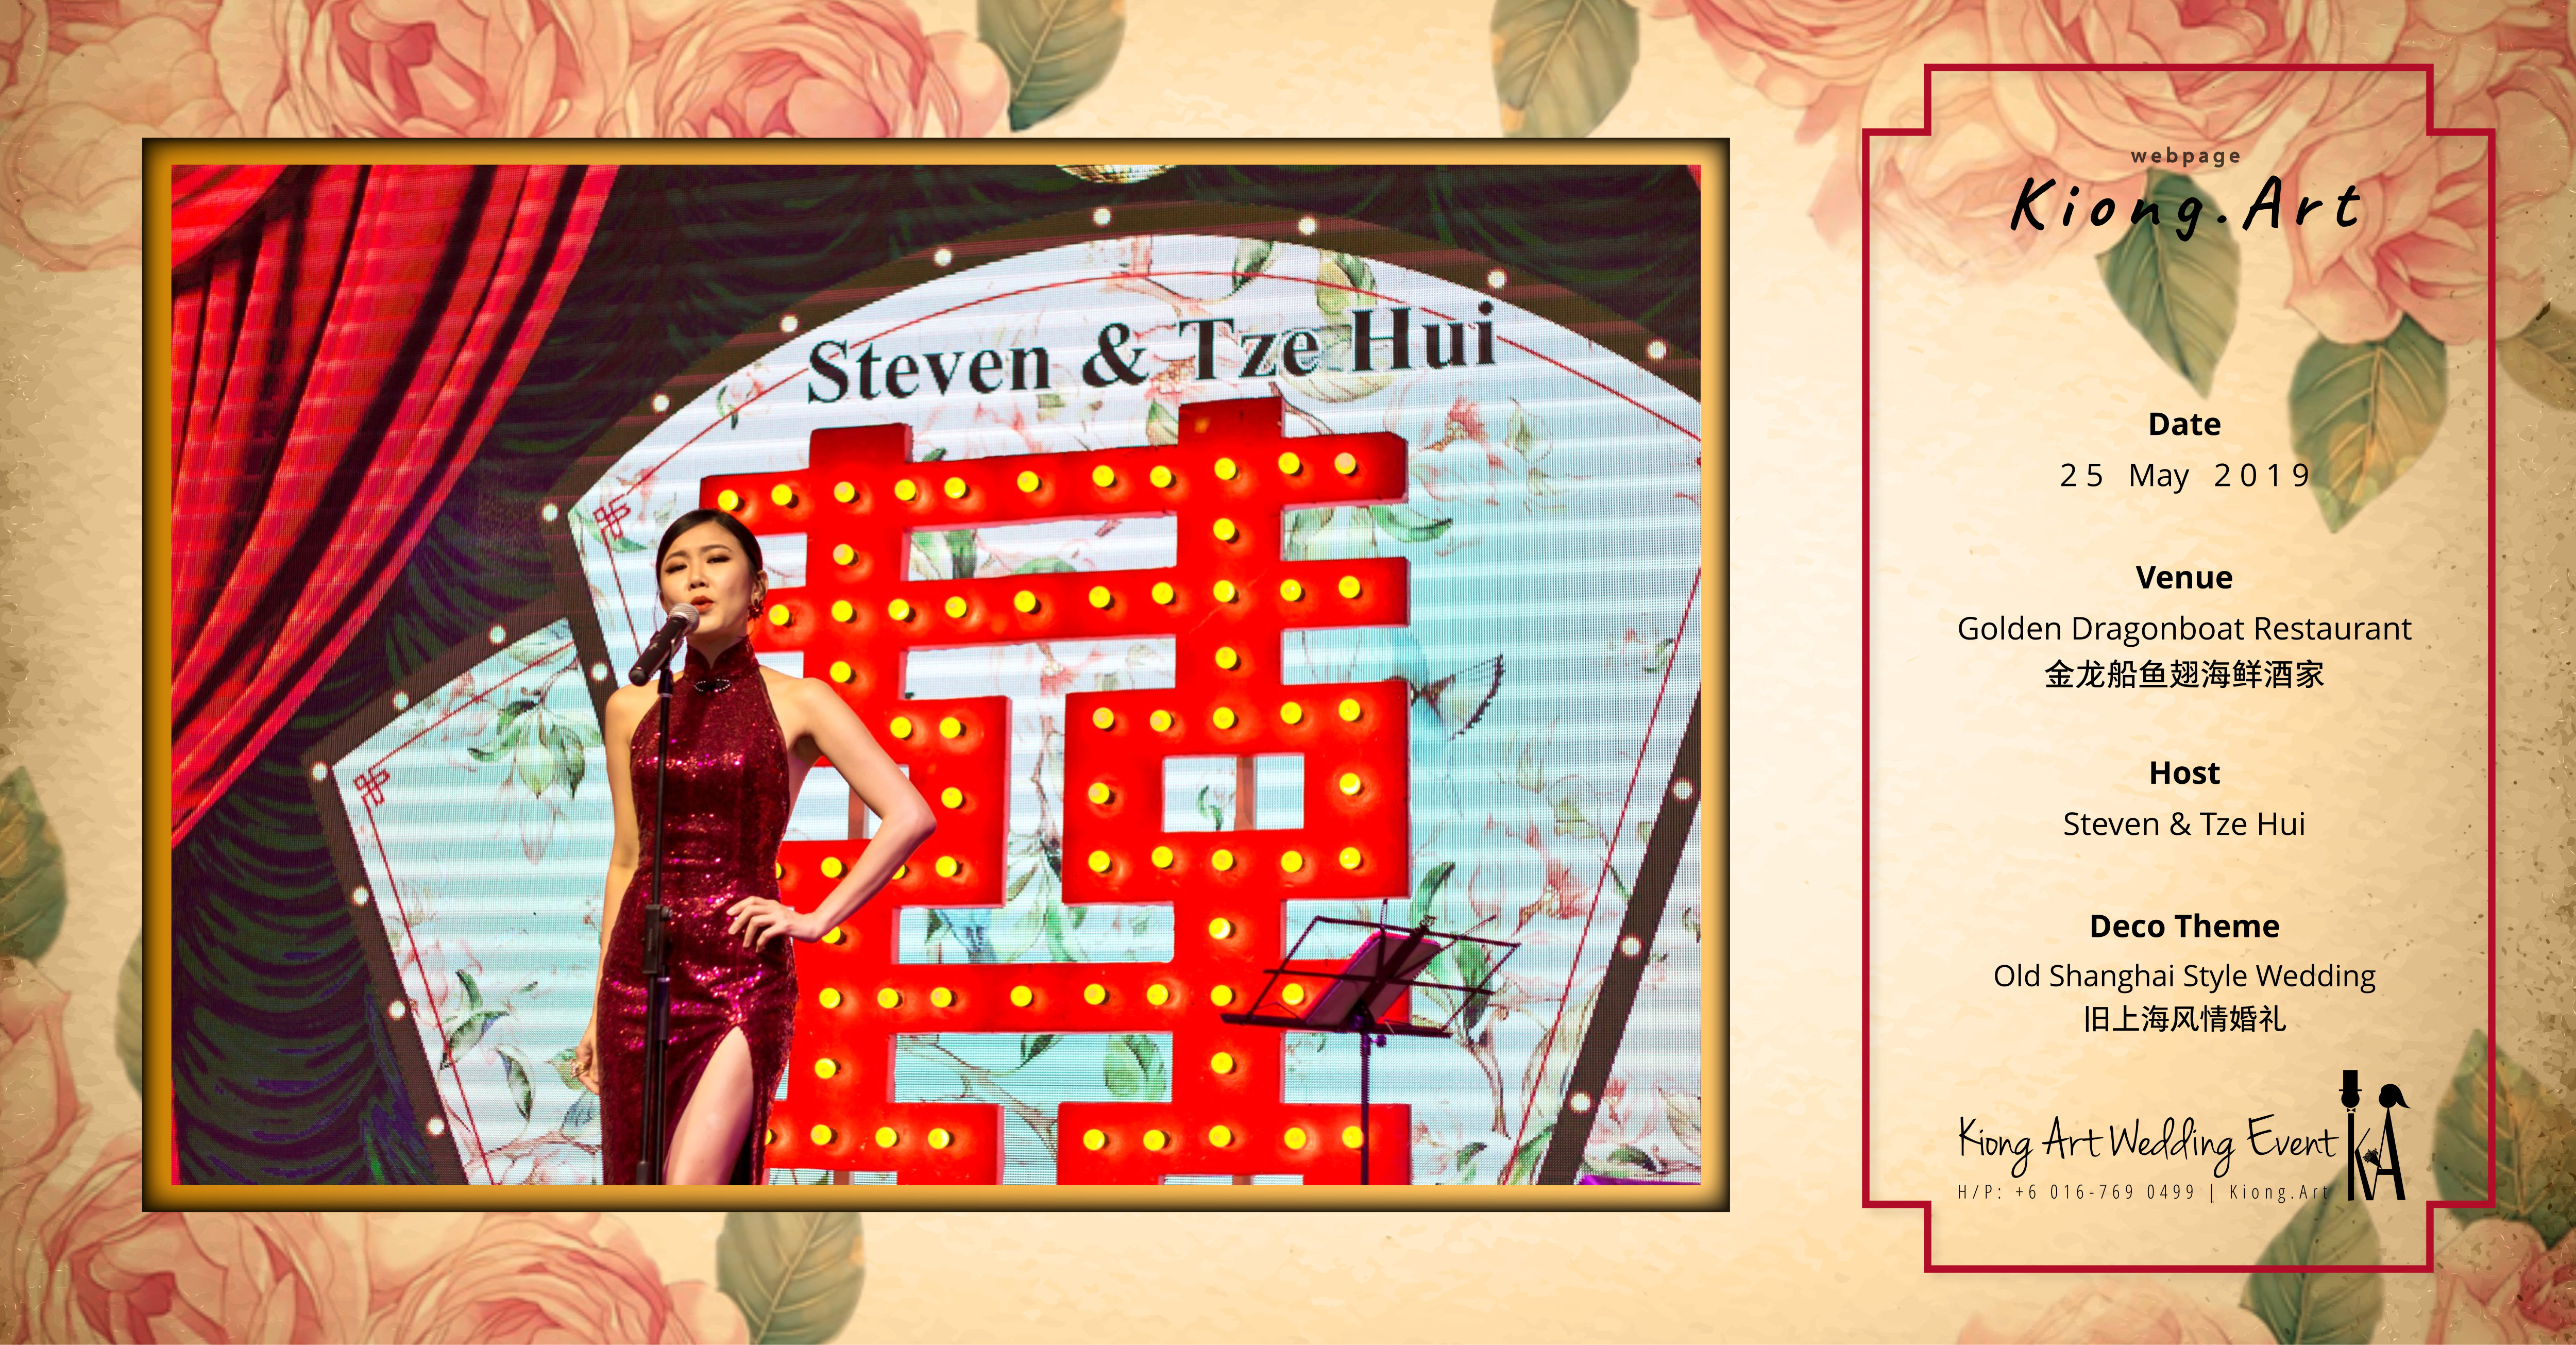 Kuala Lumpur Wedding Deco Decoration Kiong Art Wedding Deco Old Shanghai Style Wedding 旧上海风情婚礼 Steven and Tze Hui at Golden Dragonboat Restaurant 金龙船鱼翅海鲜酒家 Malaysia A16-B00-009